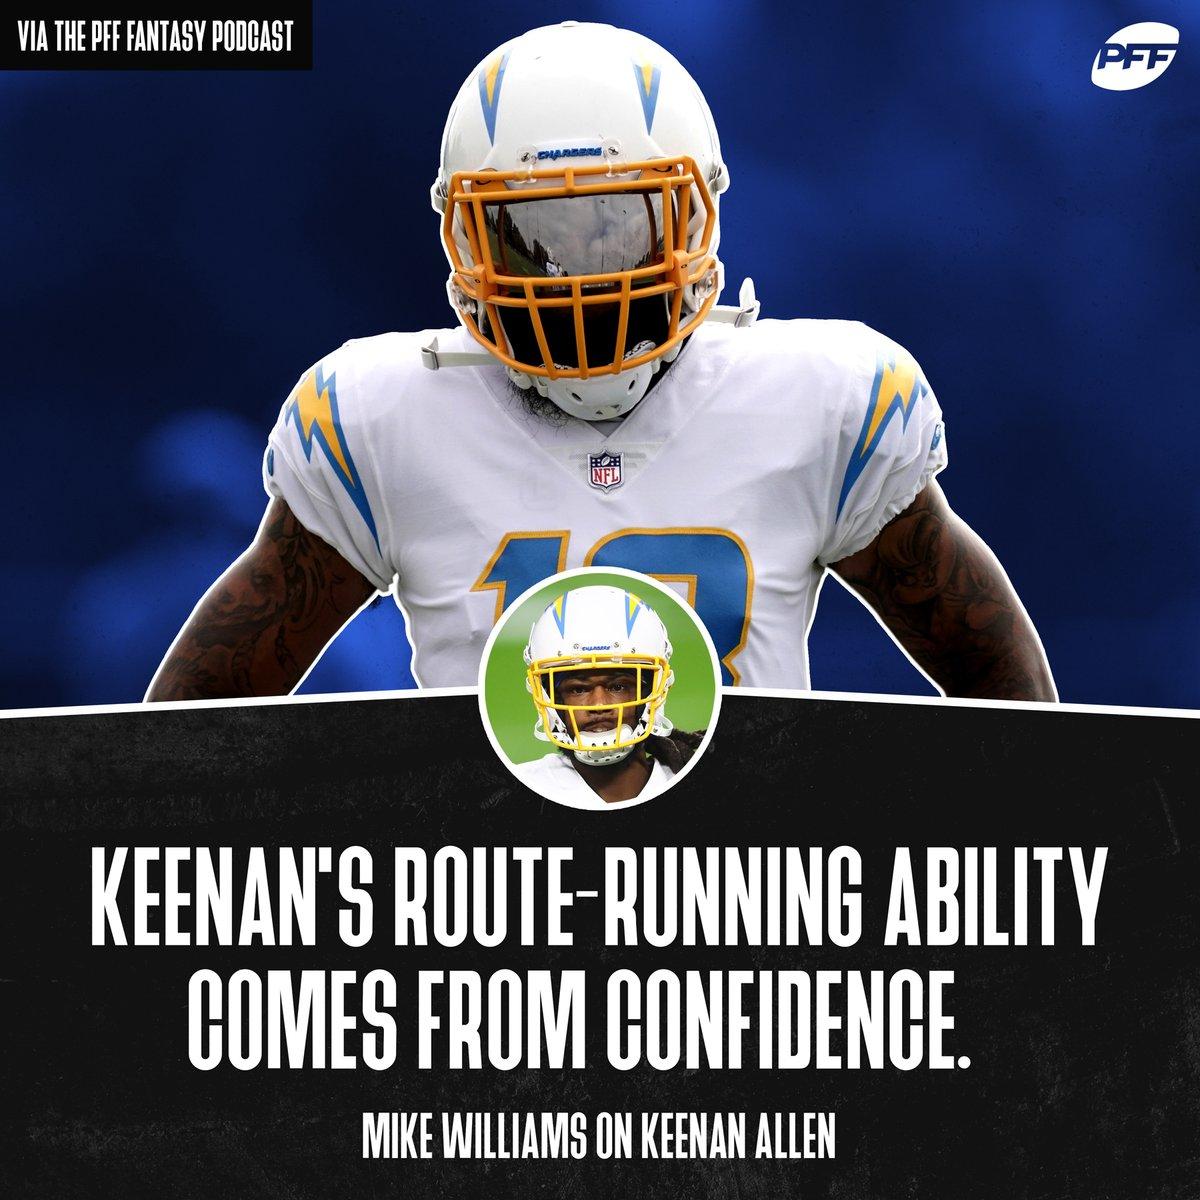 Is Keenan Allen the best route-runner in the NFL? https://t.co/I8GFcBpG1H